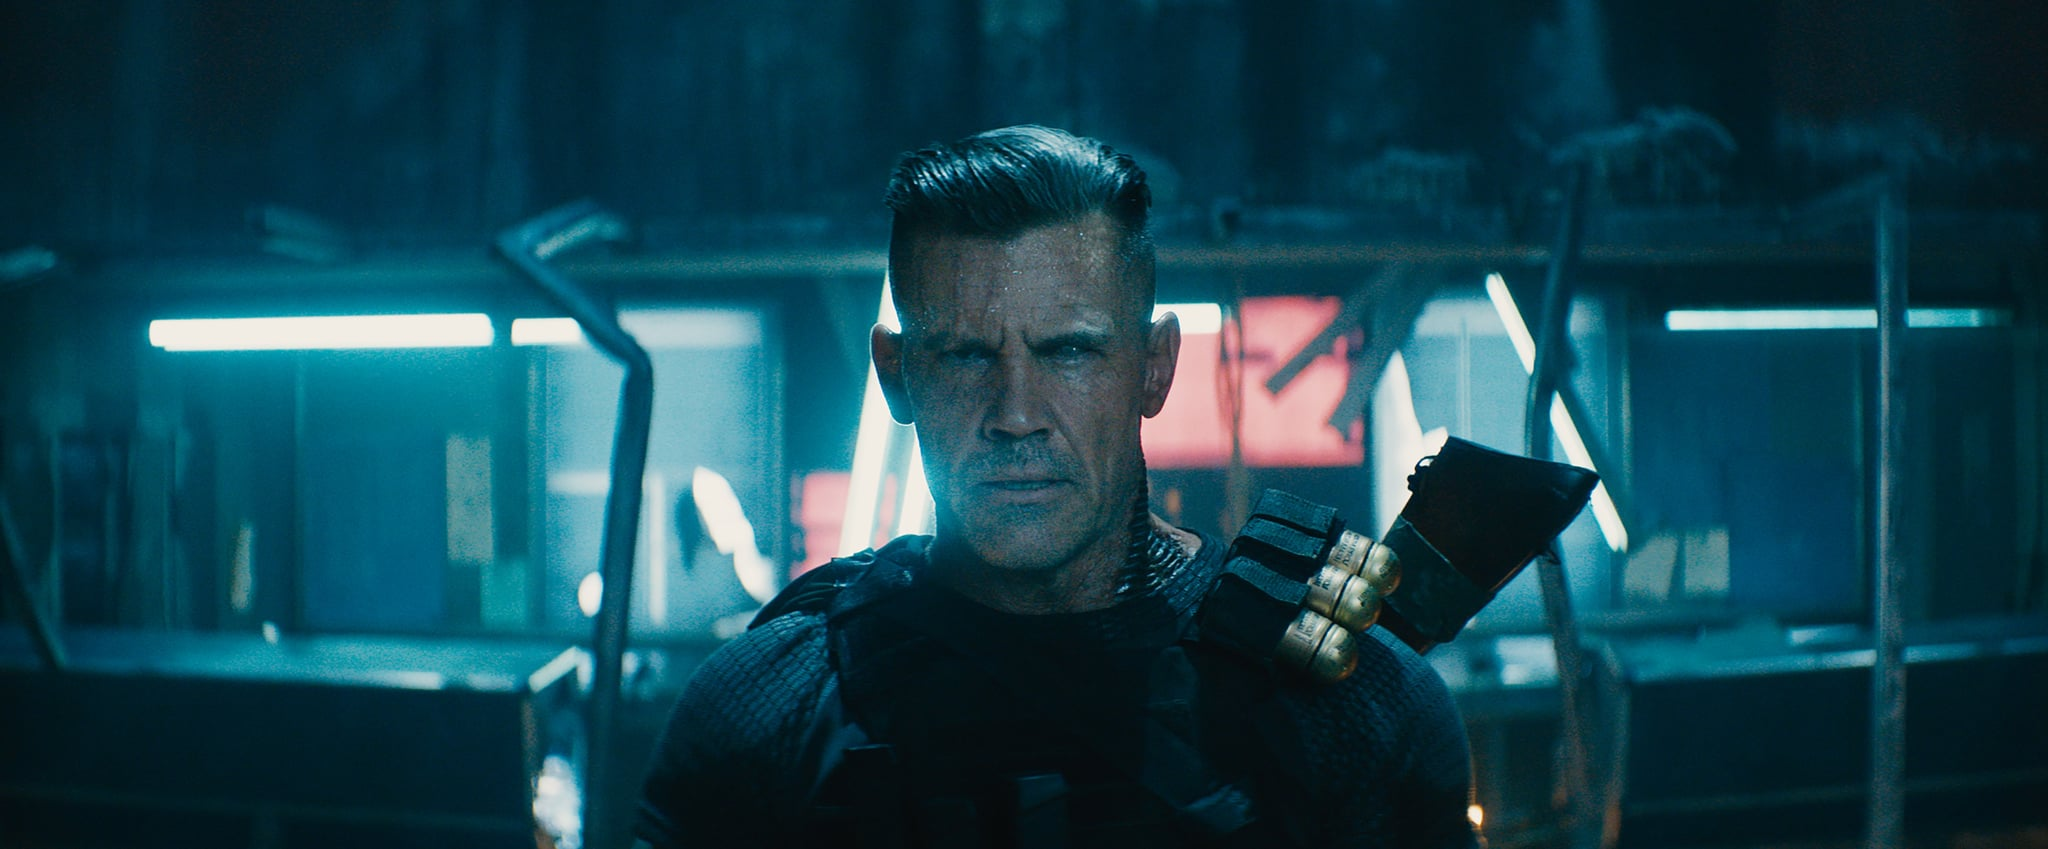 dp2_stills_pull01_rec709_020218.086241 – Josh Brolin as Cable in Twentieth Century Fox's DEADPOOL 2. Photo Credit: Courtesy Twentieth Century Fox.